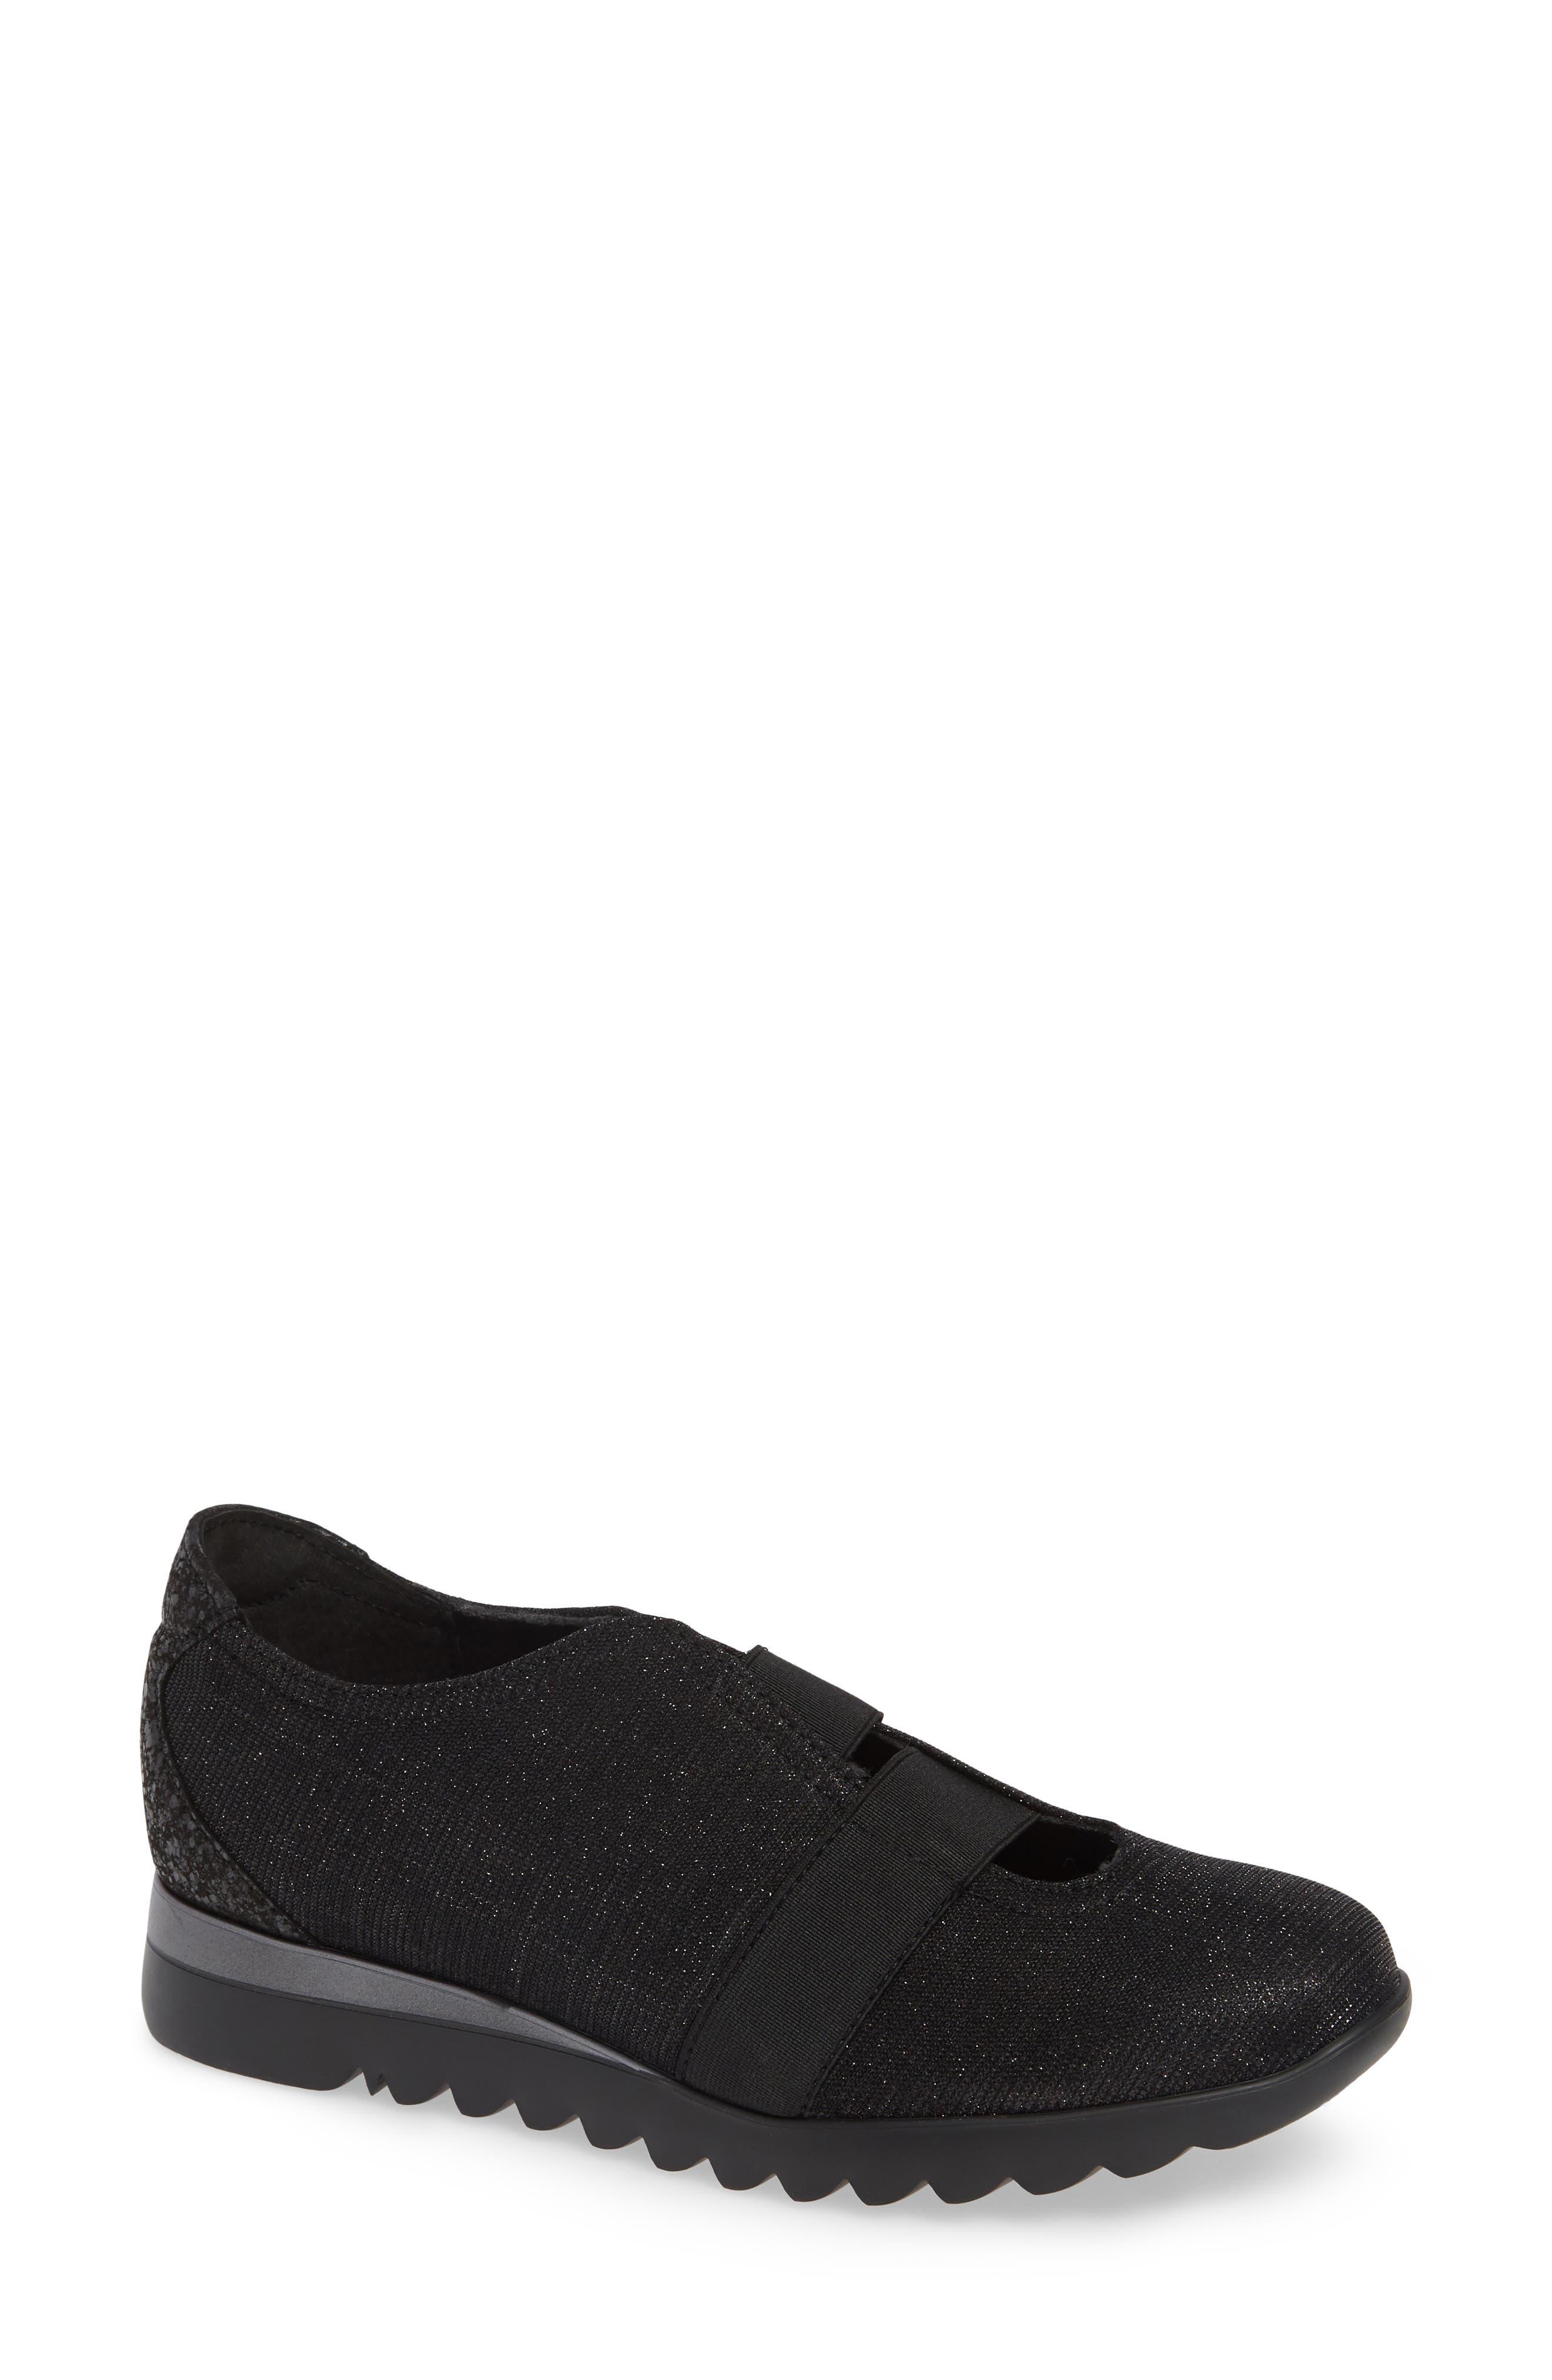 Munro Alta Slip-On Sneaker- Black